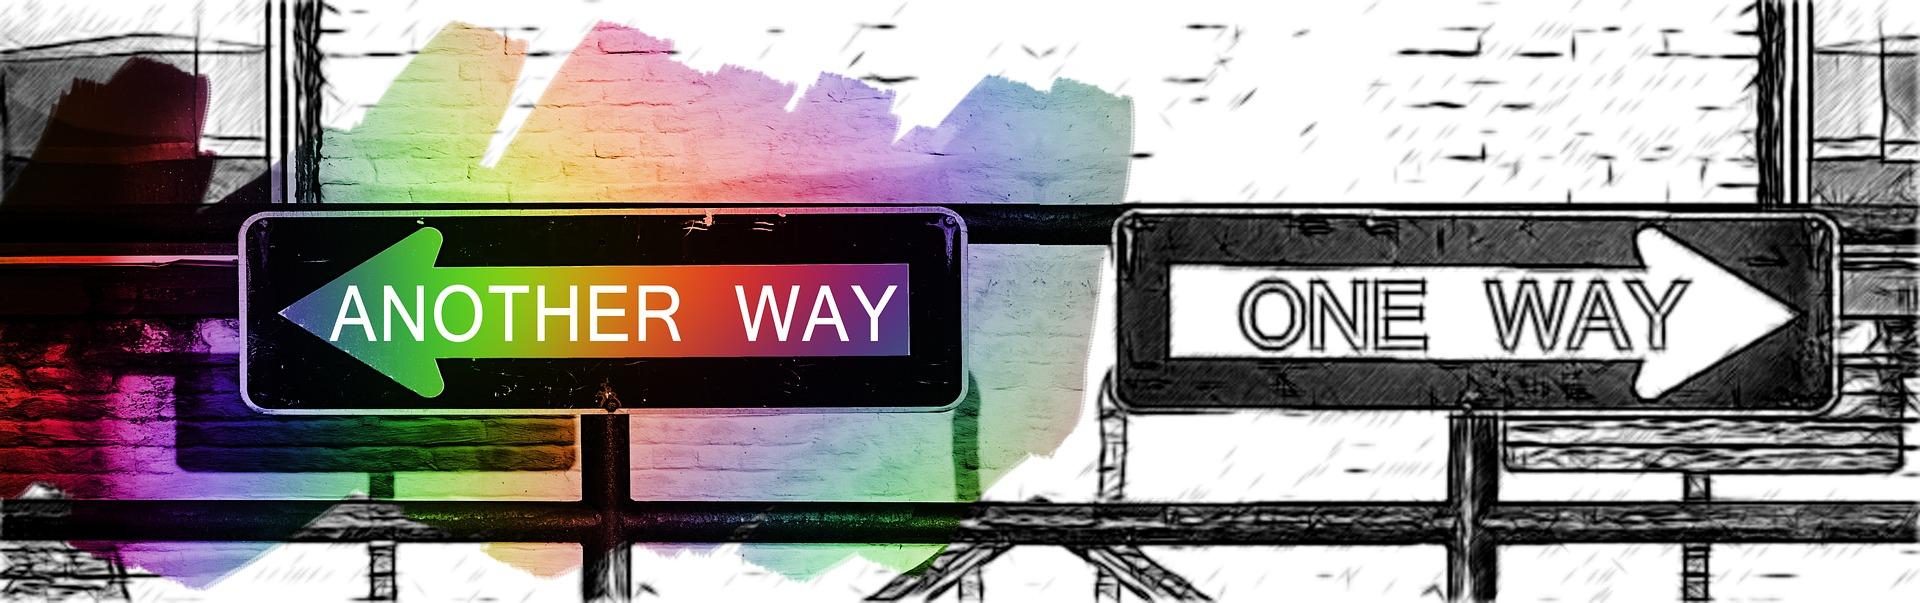 one-way-street-1113973_1920.jpg